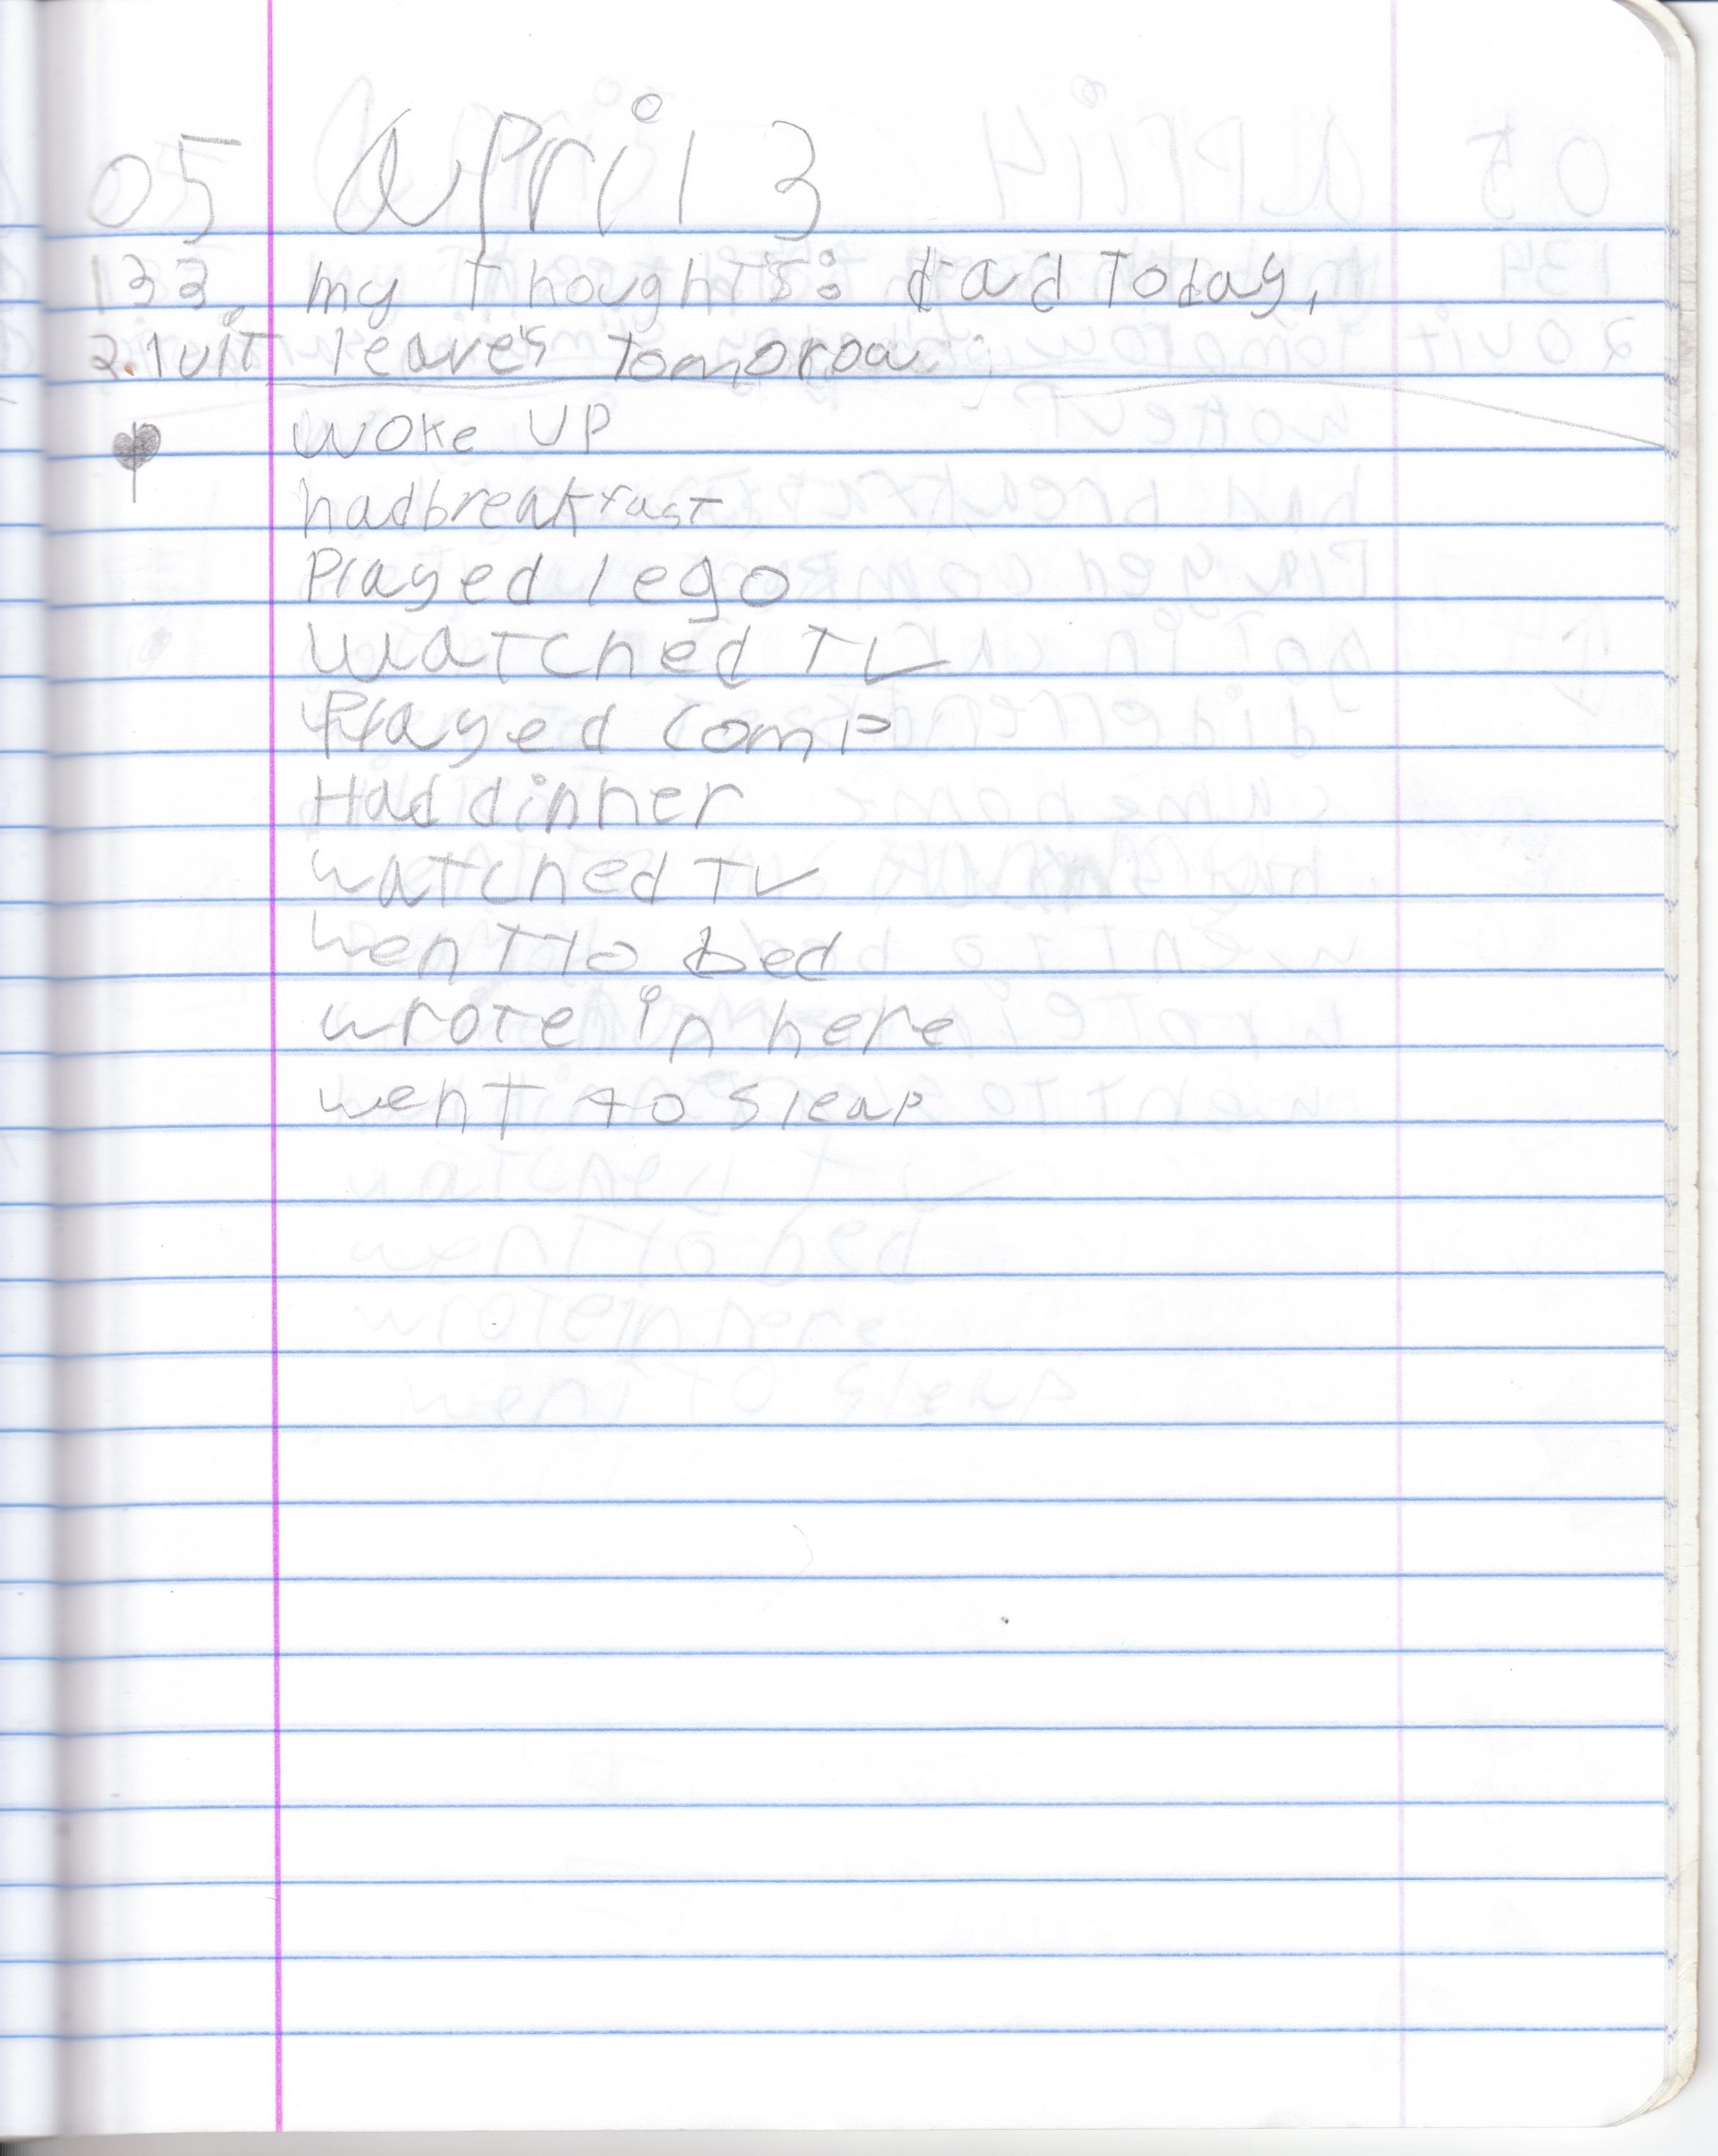 my first diary-log_Page_175.jpg